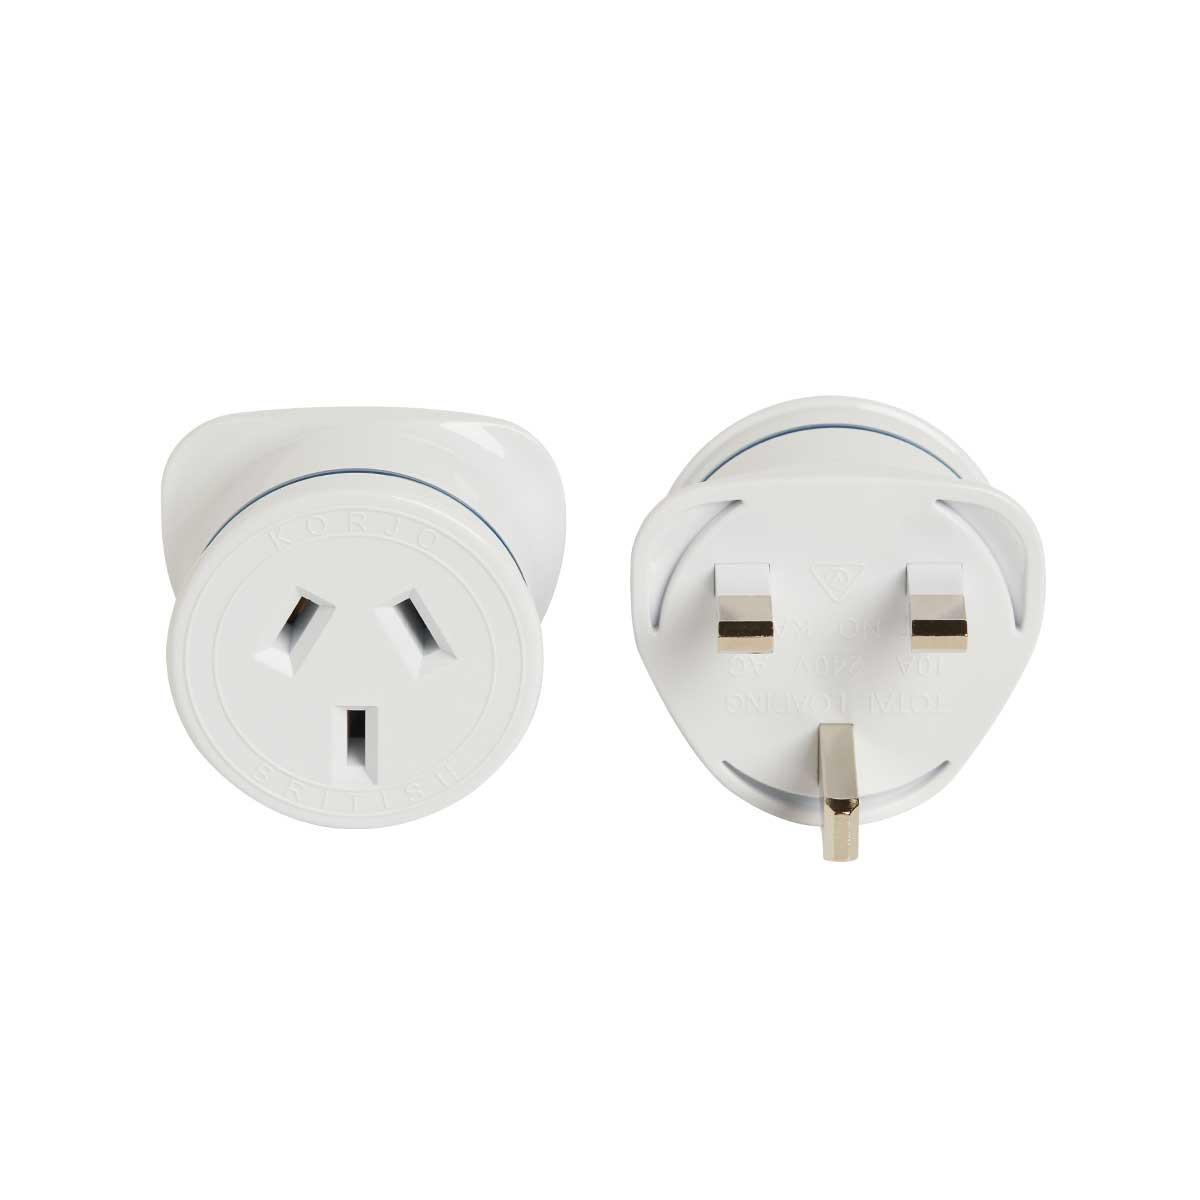 Korjo Electrical Adaptor Australia and NZ -> Great Britain